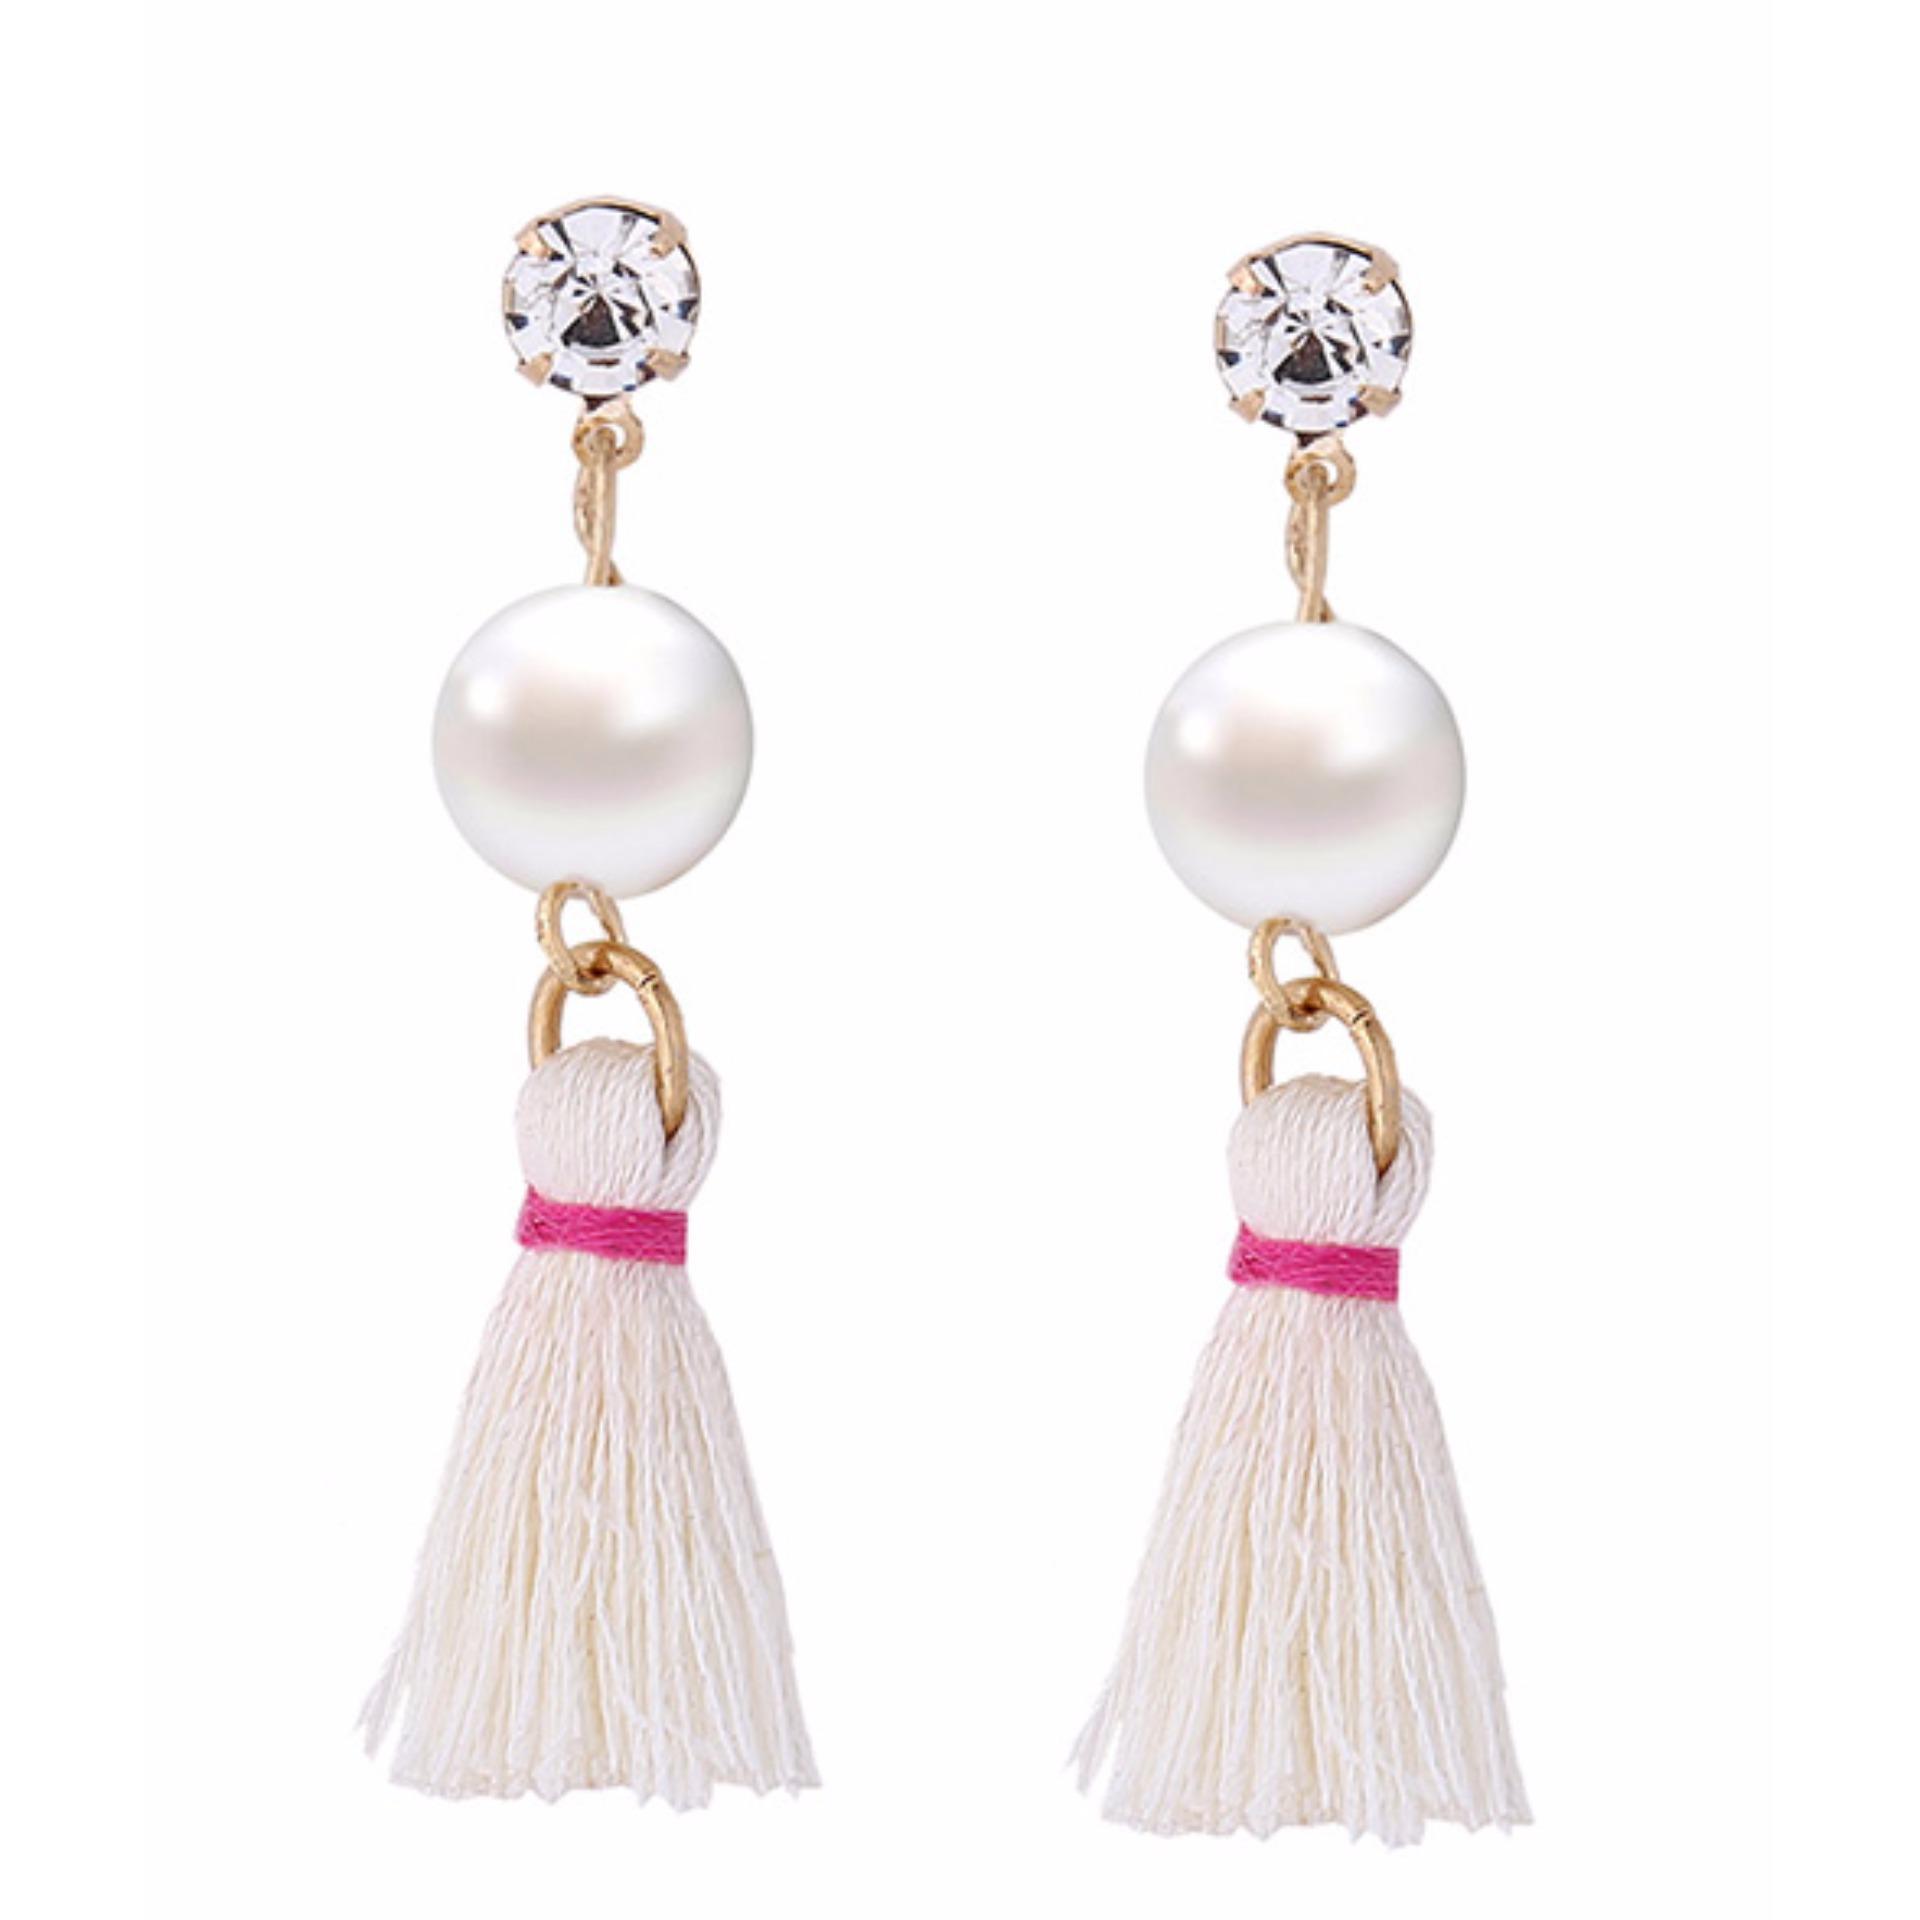 LRC Anting Tusuk Fashion Pearl&diamond Decorated Tassel Pure Color Earrings